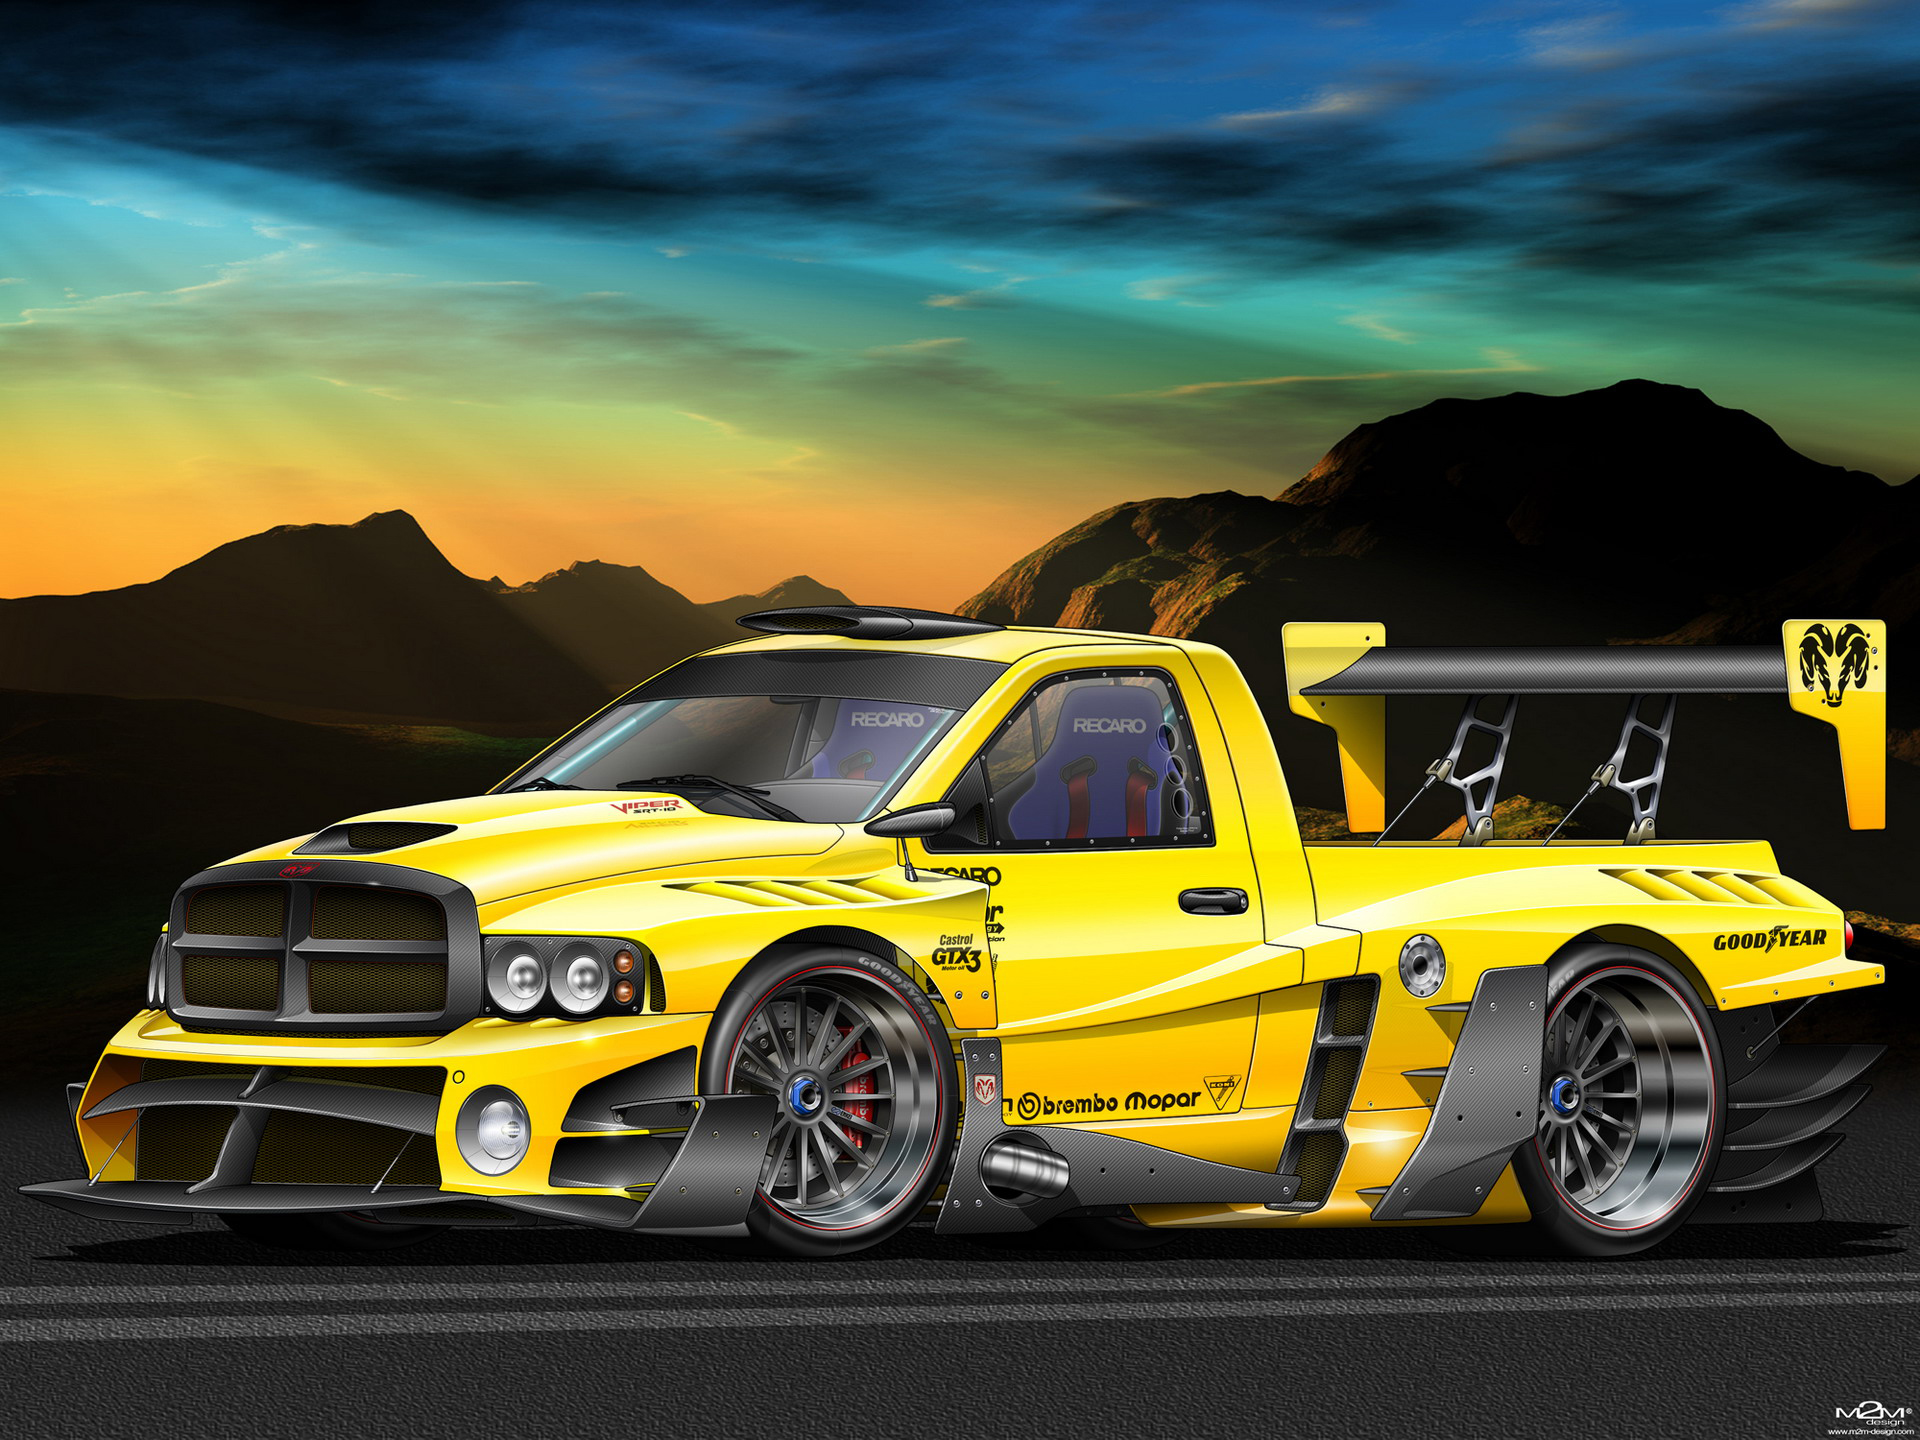 Free download Exotic Car HD Wallpaper Car Wallpapers ...